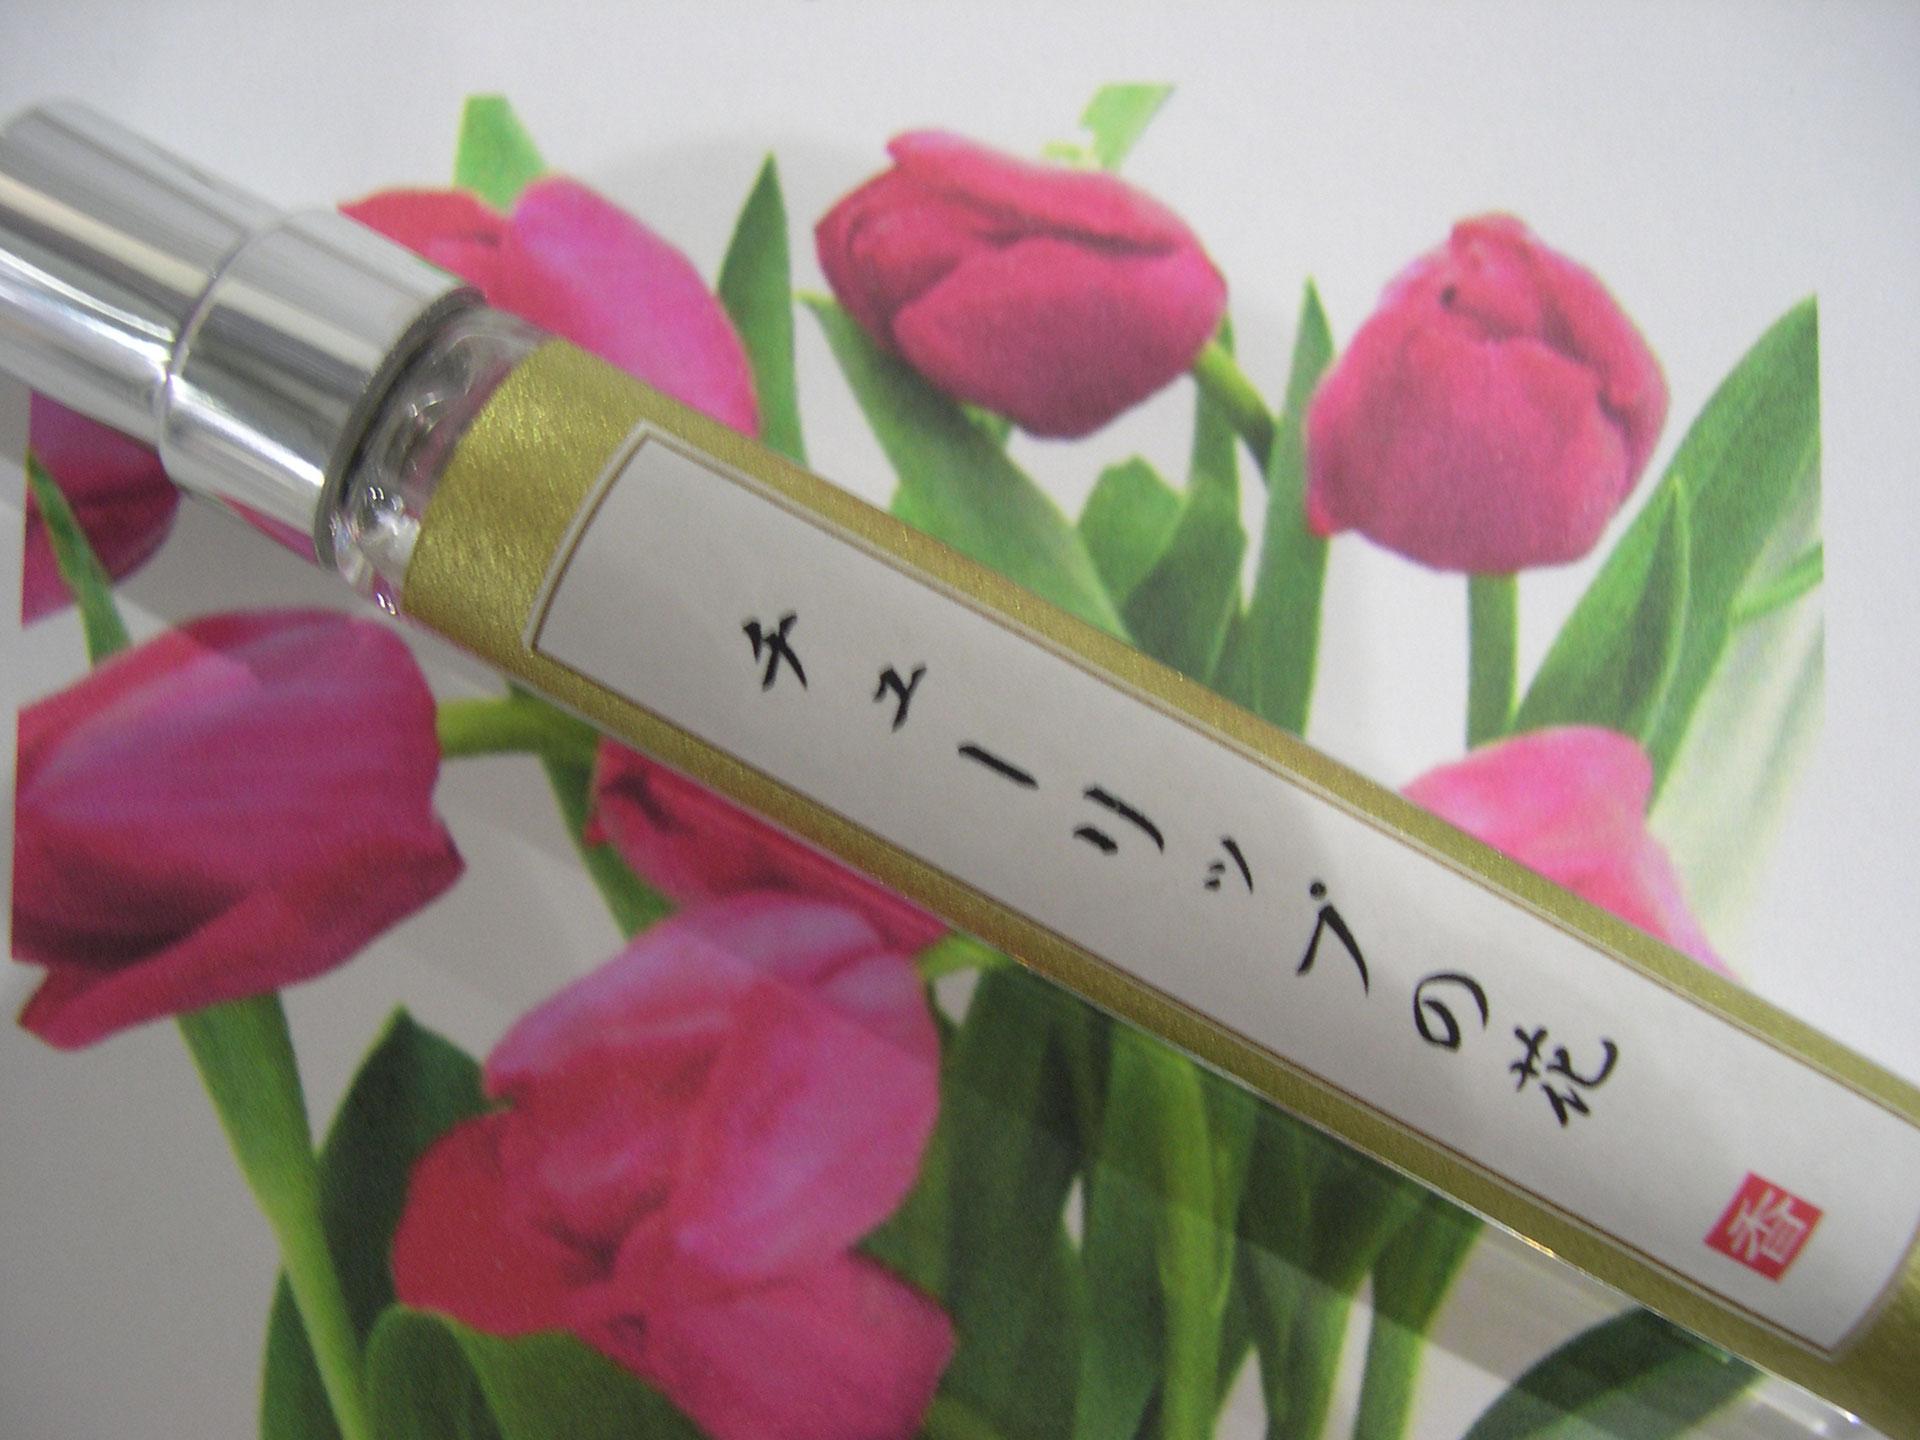 premium selection 8a52d d667d オリジナル香水の店 - 名古屋栄ガスビル1Fにある調香師の ...